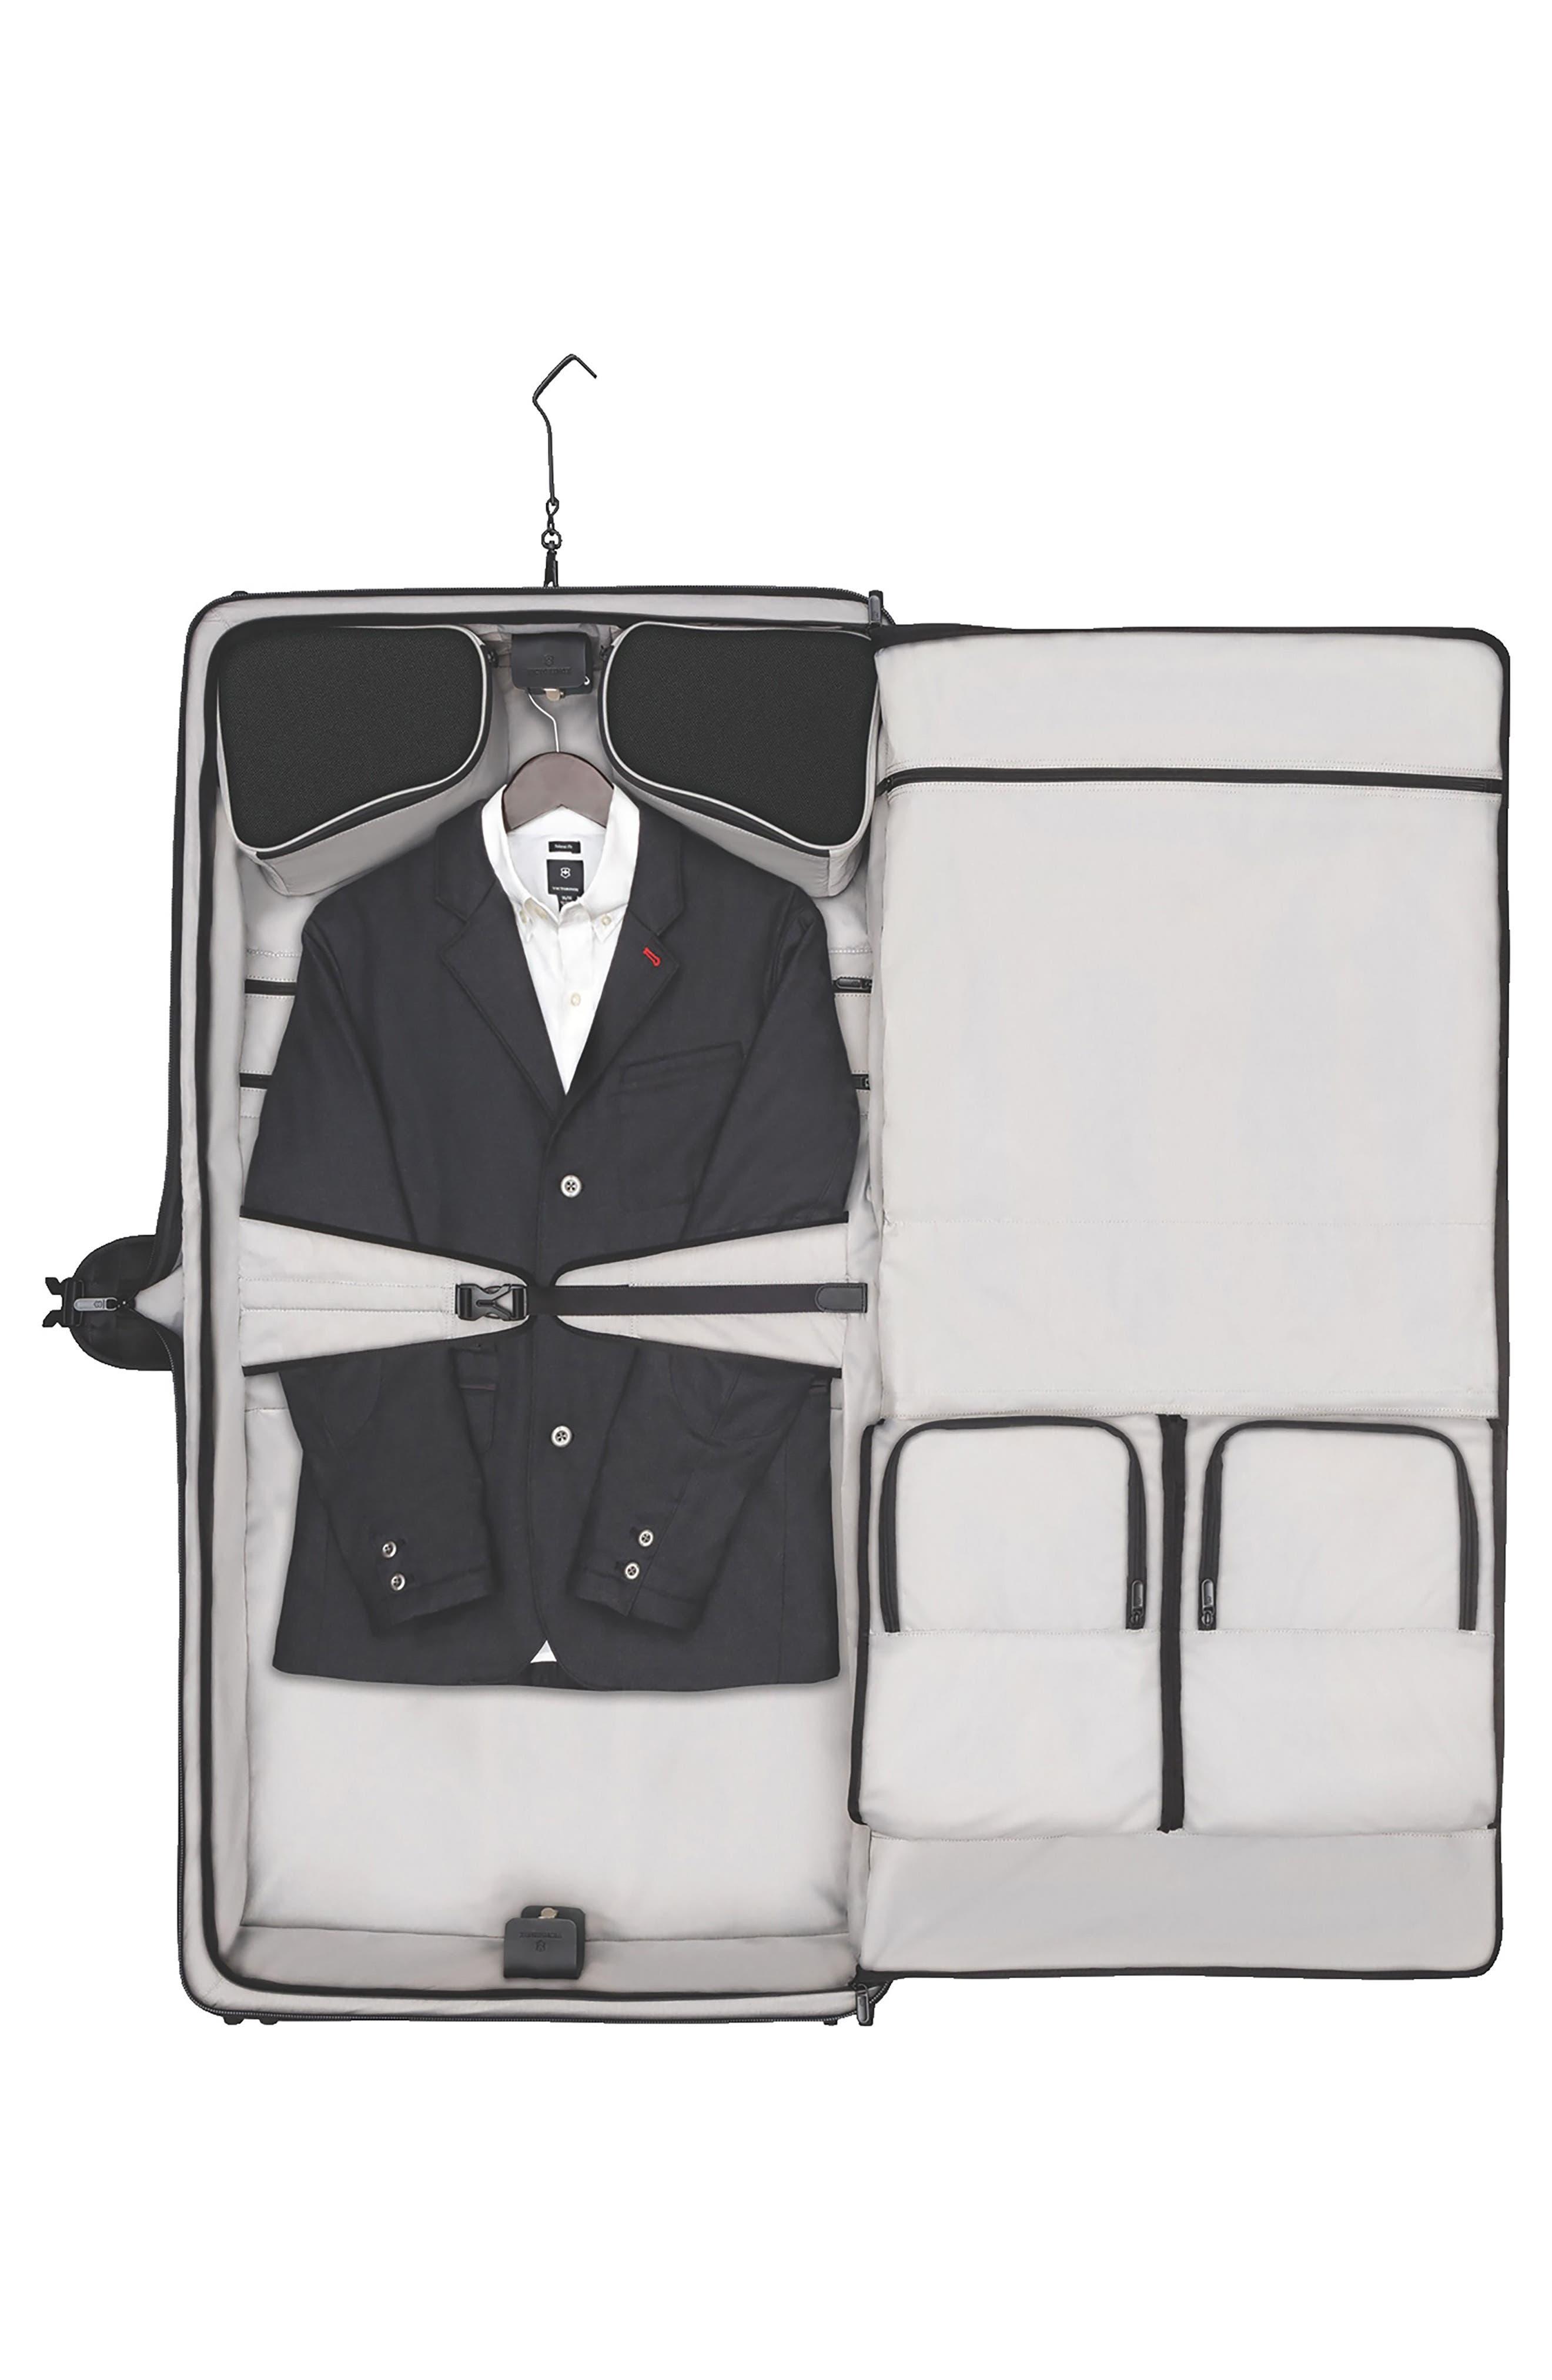 Lexicon 2.0 Wheeled Garment Bag,                             Alternate thumbnail 3, color,                             001